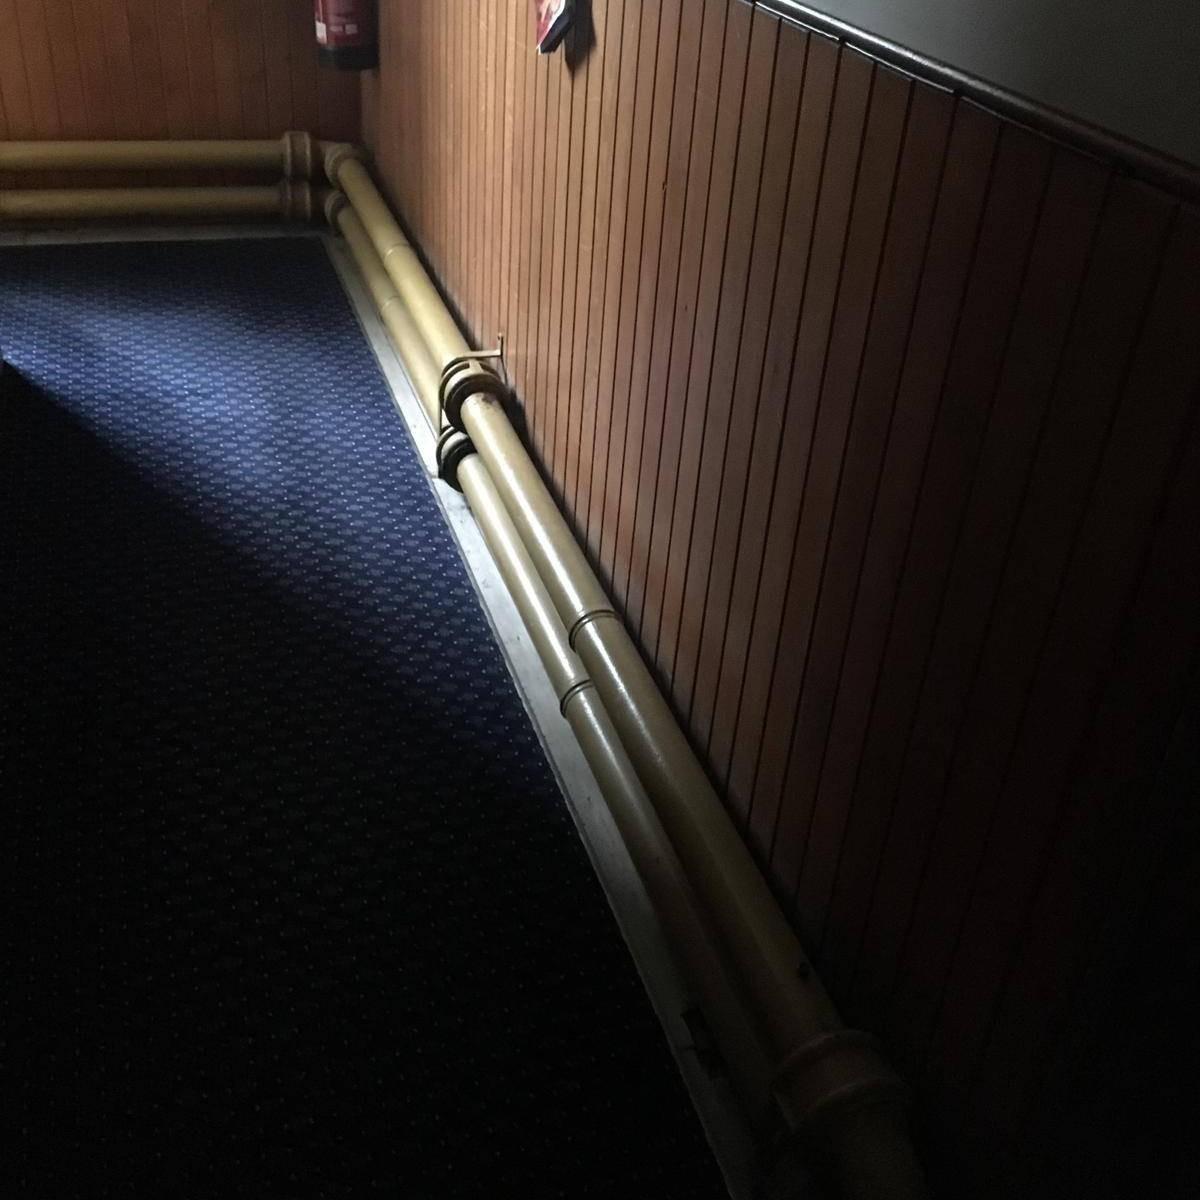 Photos from Bishopton Parish Church heating system 29